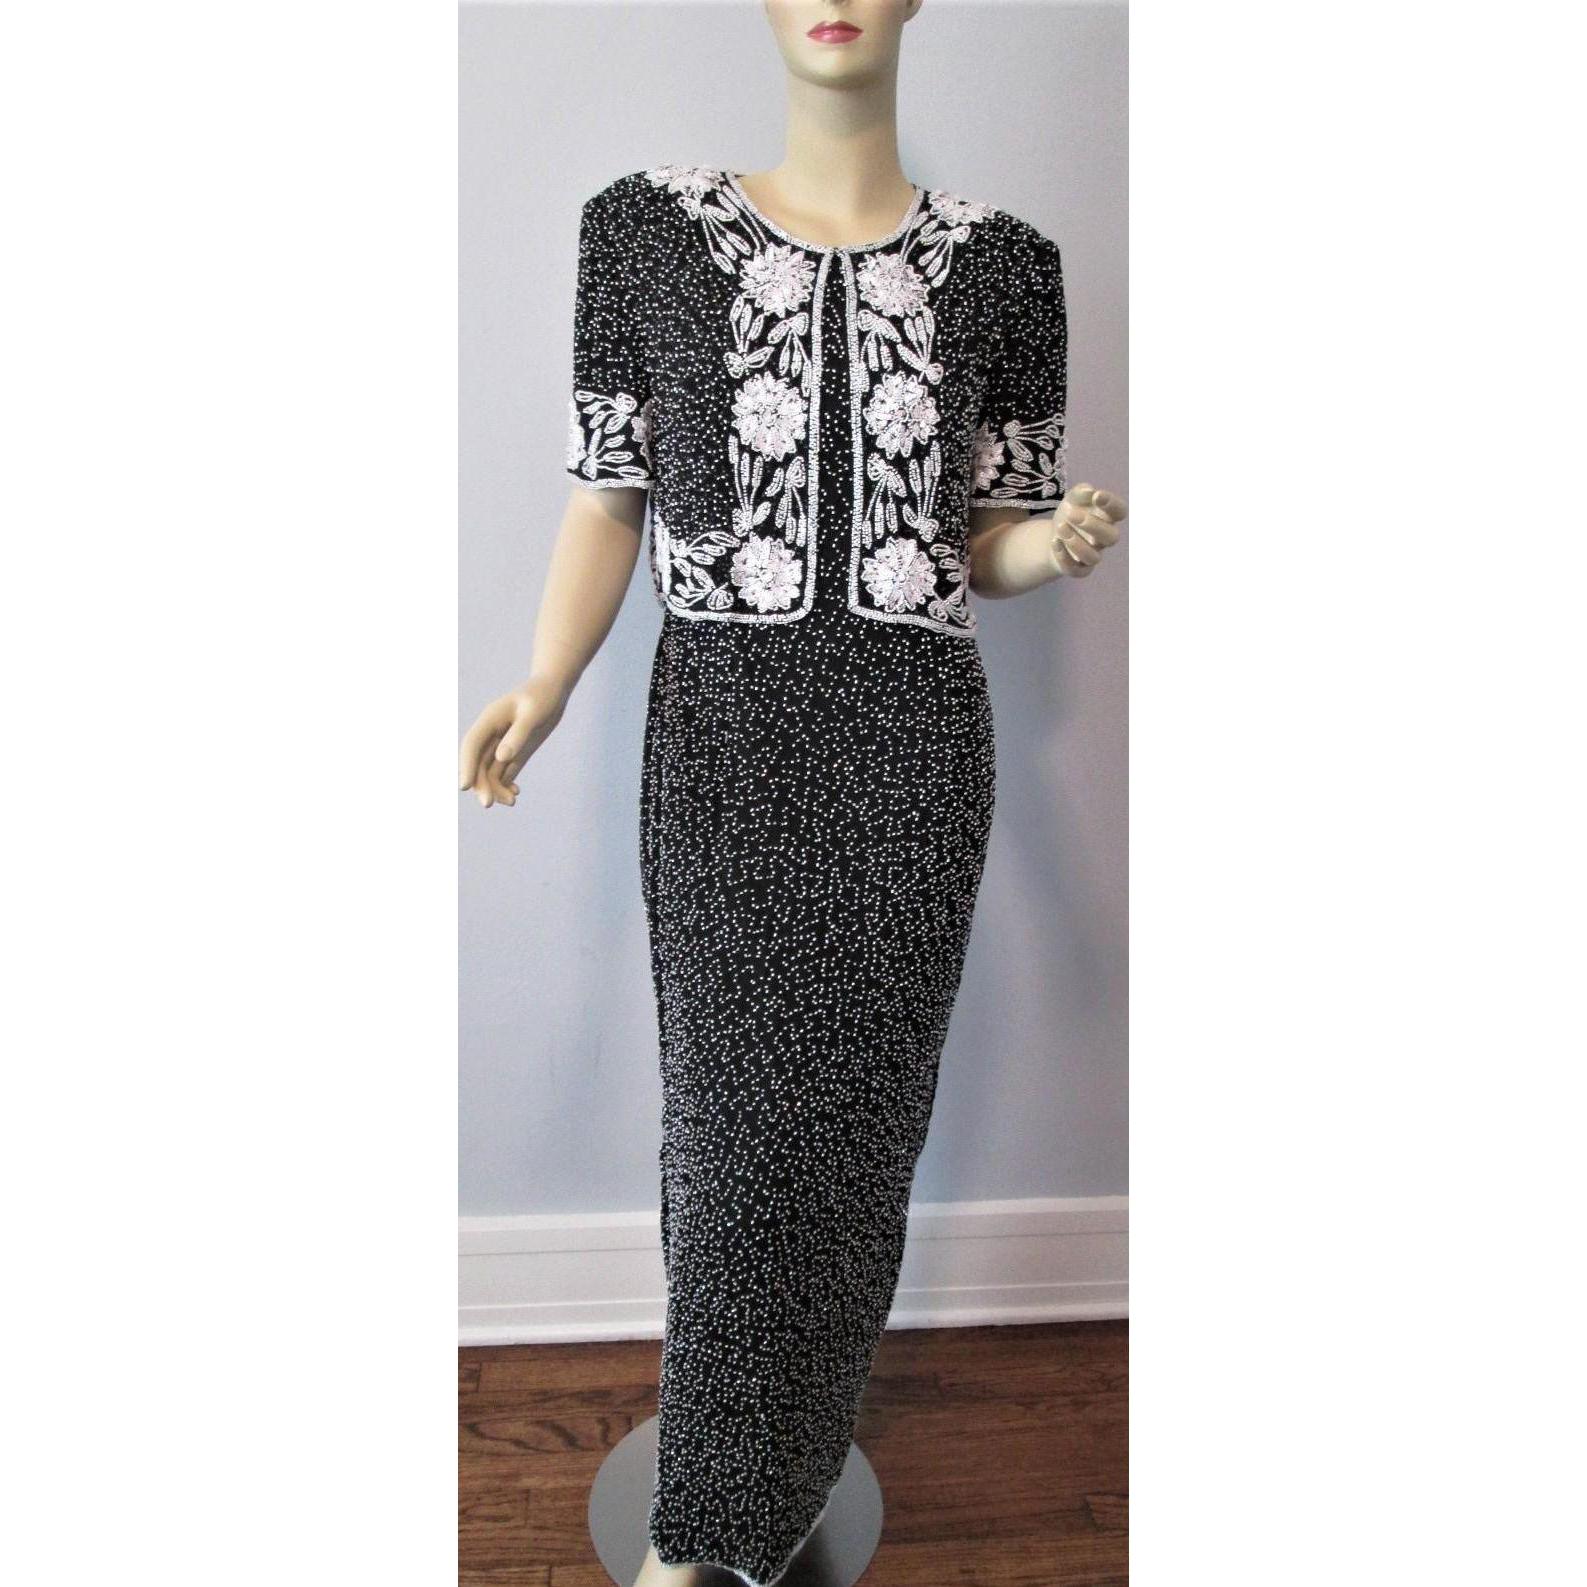 Silk beaded evening gown dress jacket vintage s black white